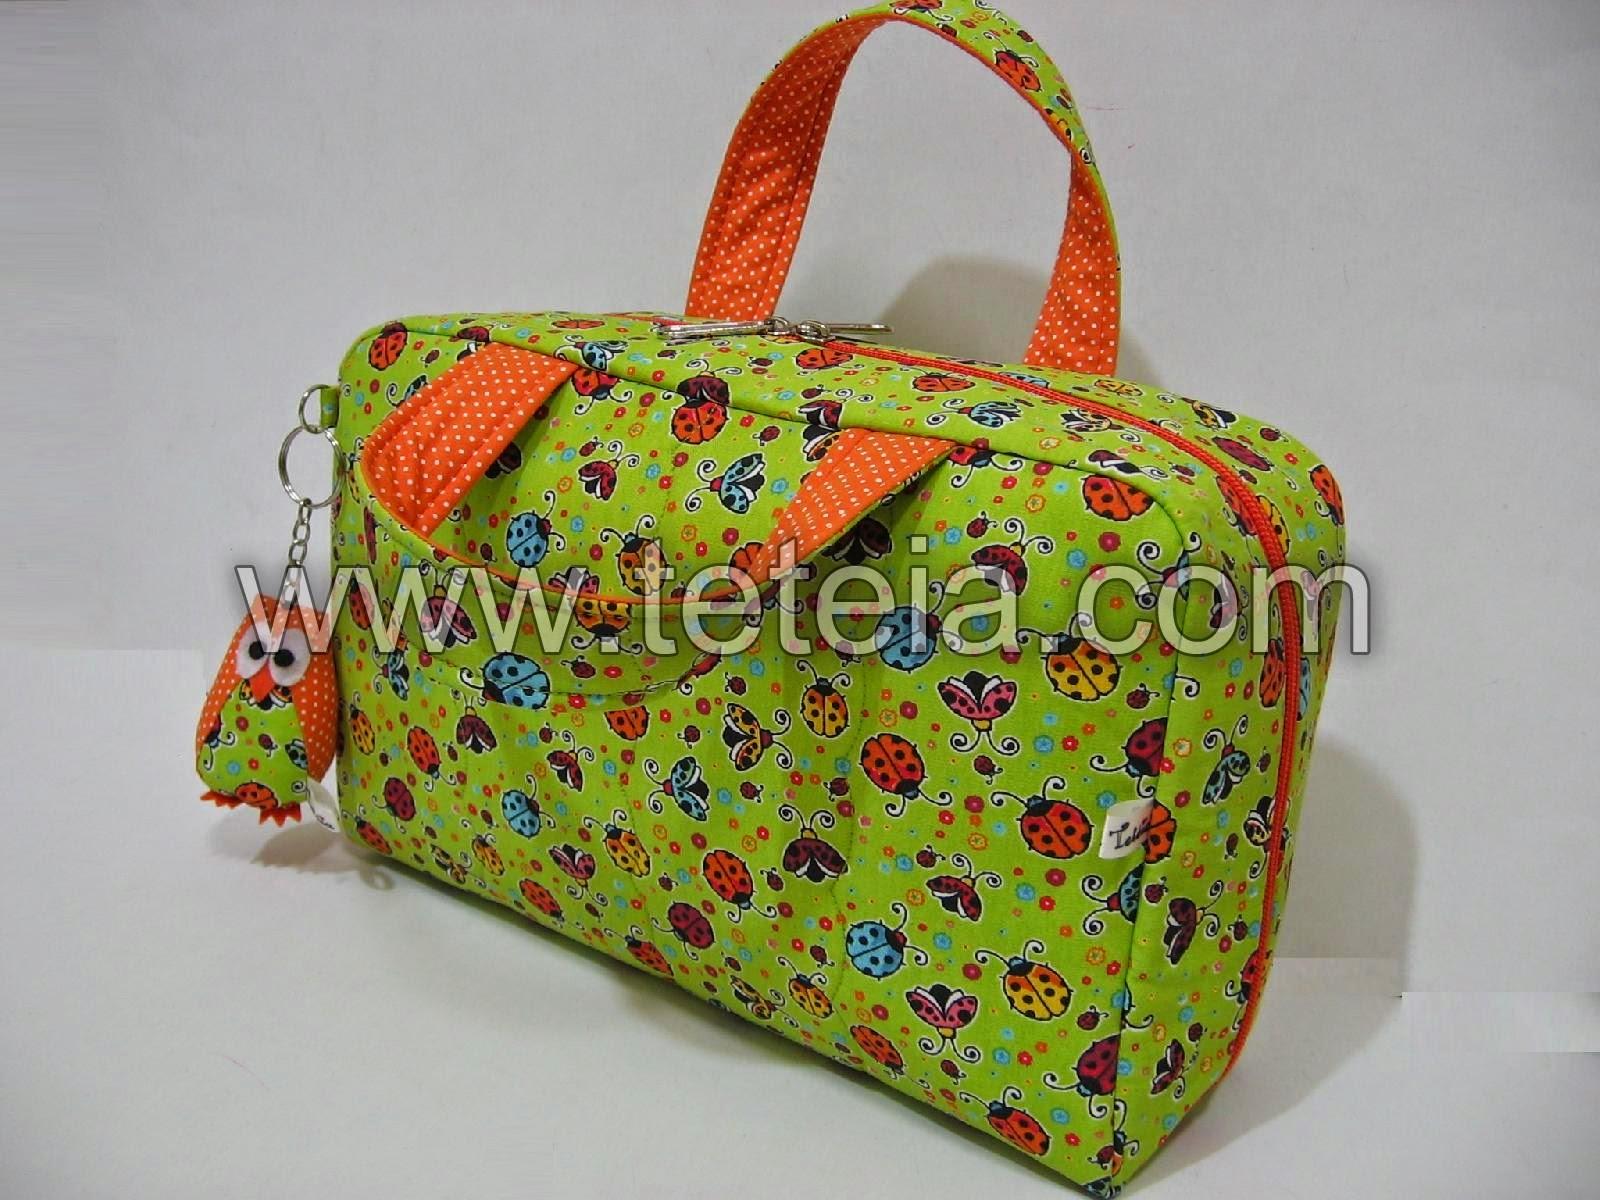 0608ff0a8 Tetéia Patchwork: Necessaire/maleta médica grande_joaninhas verde ...